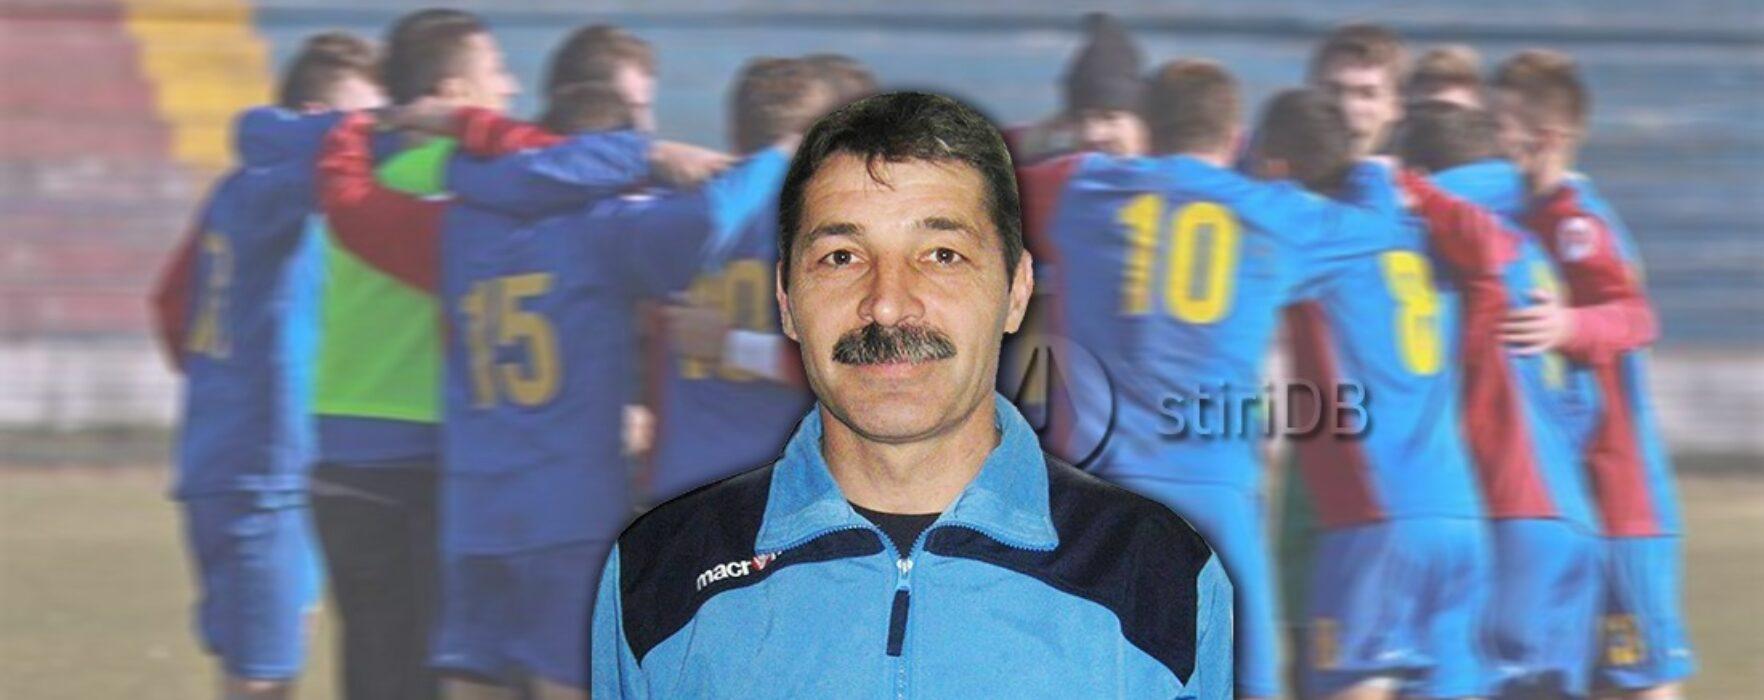 Nicu Croitoru, noul antrenor al Chindia Târgovişte